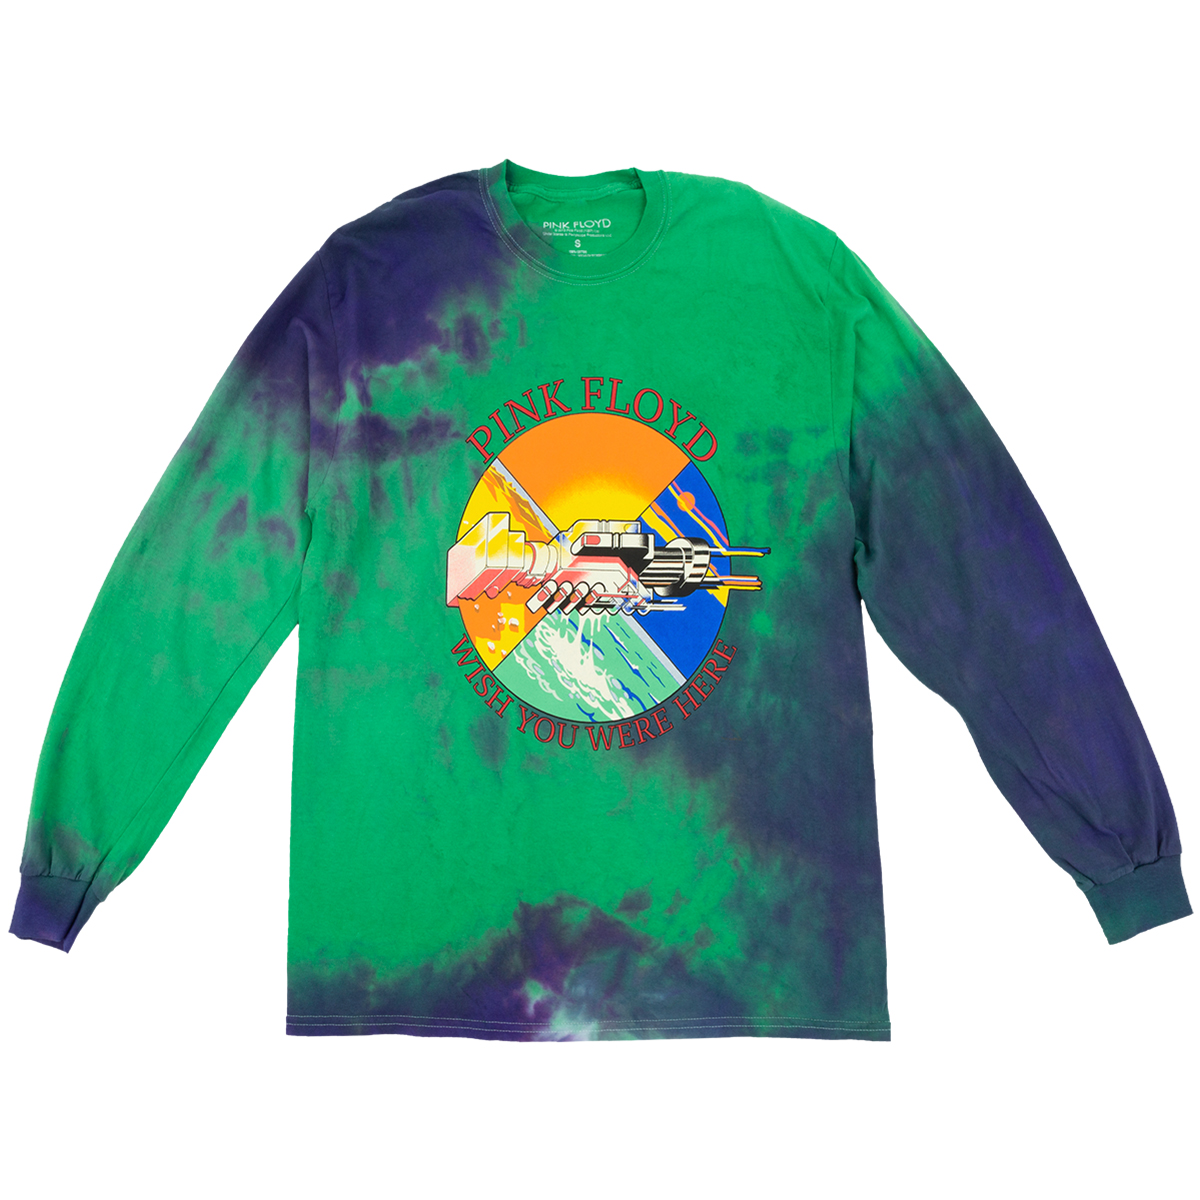 Wish You Were Here Tie Dye Longsleeve T-shirt